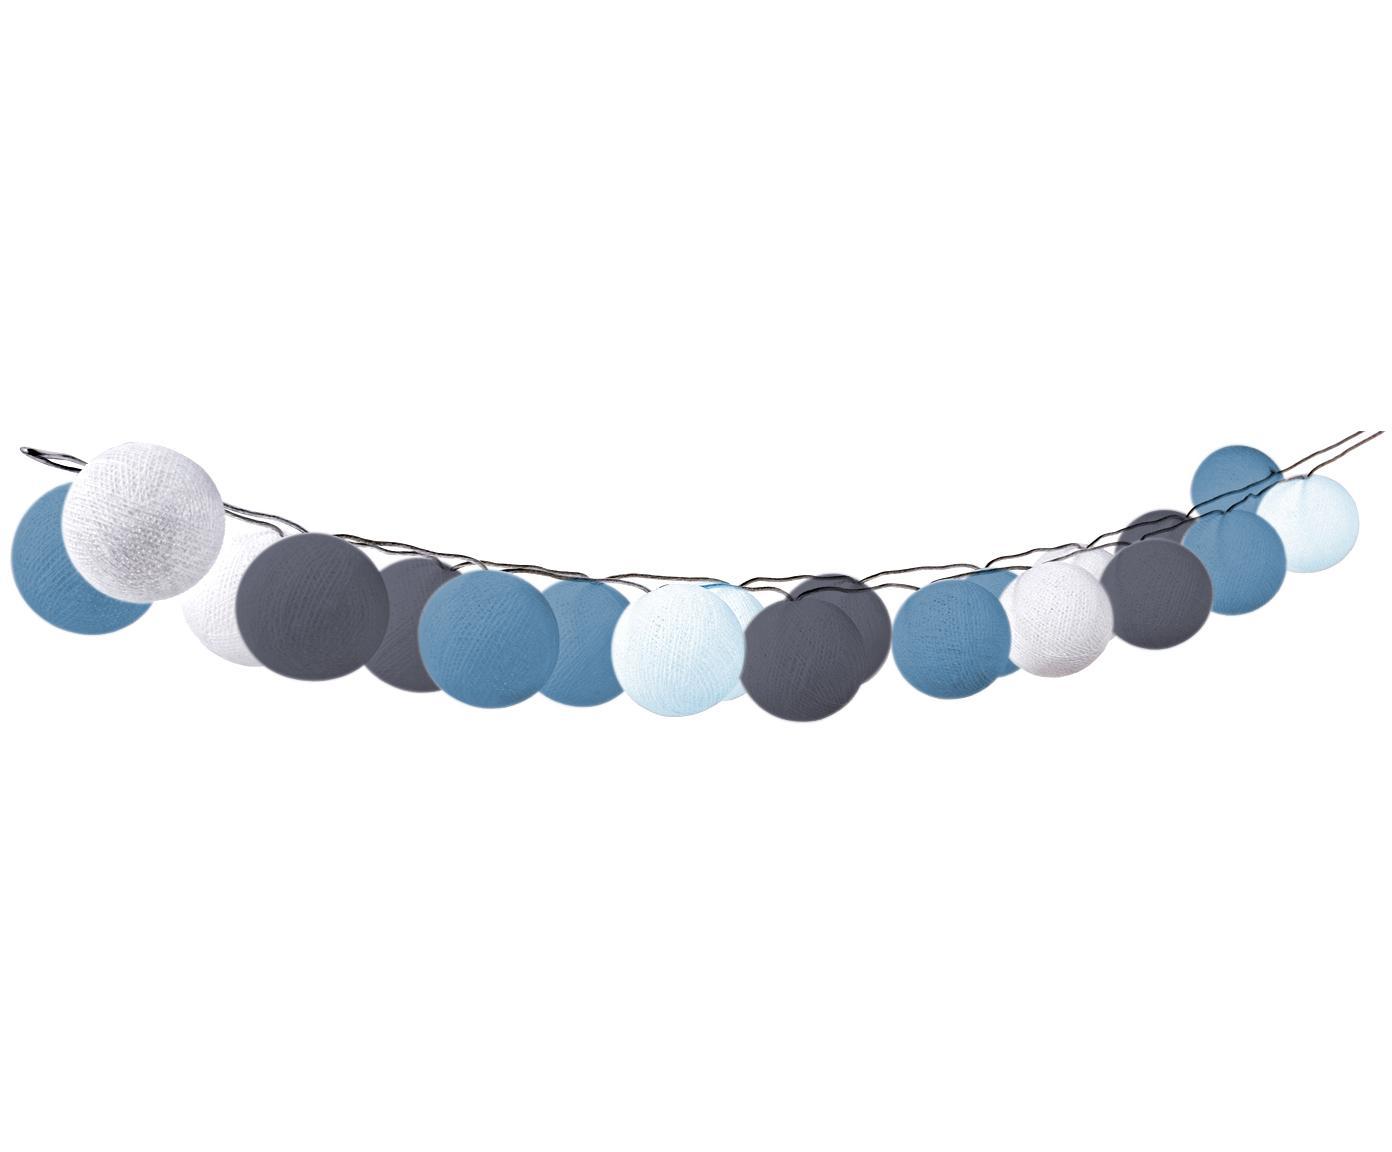 LED lichtslinger Bellin, Lampions: katoen, Blau, lichtblauw, donkerblauw, wit, L 320 cm